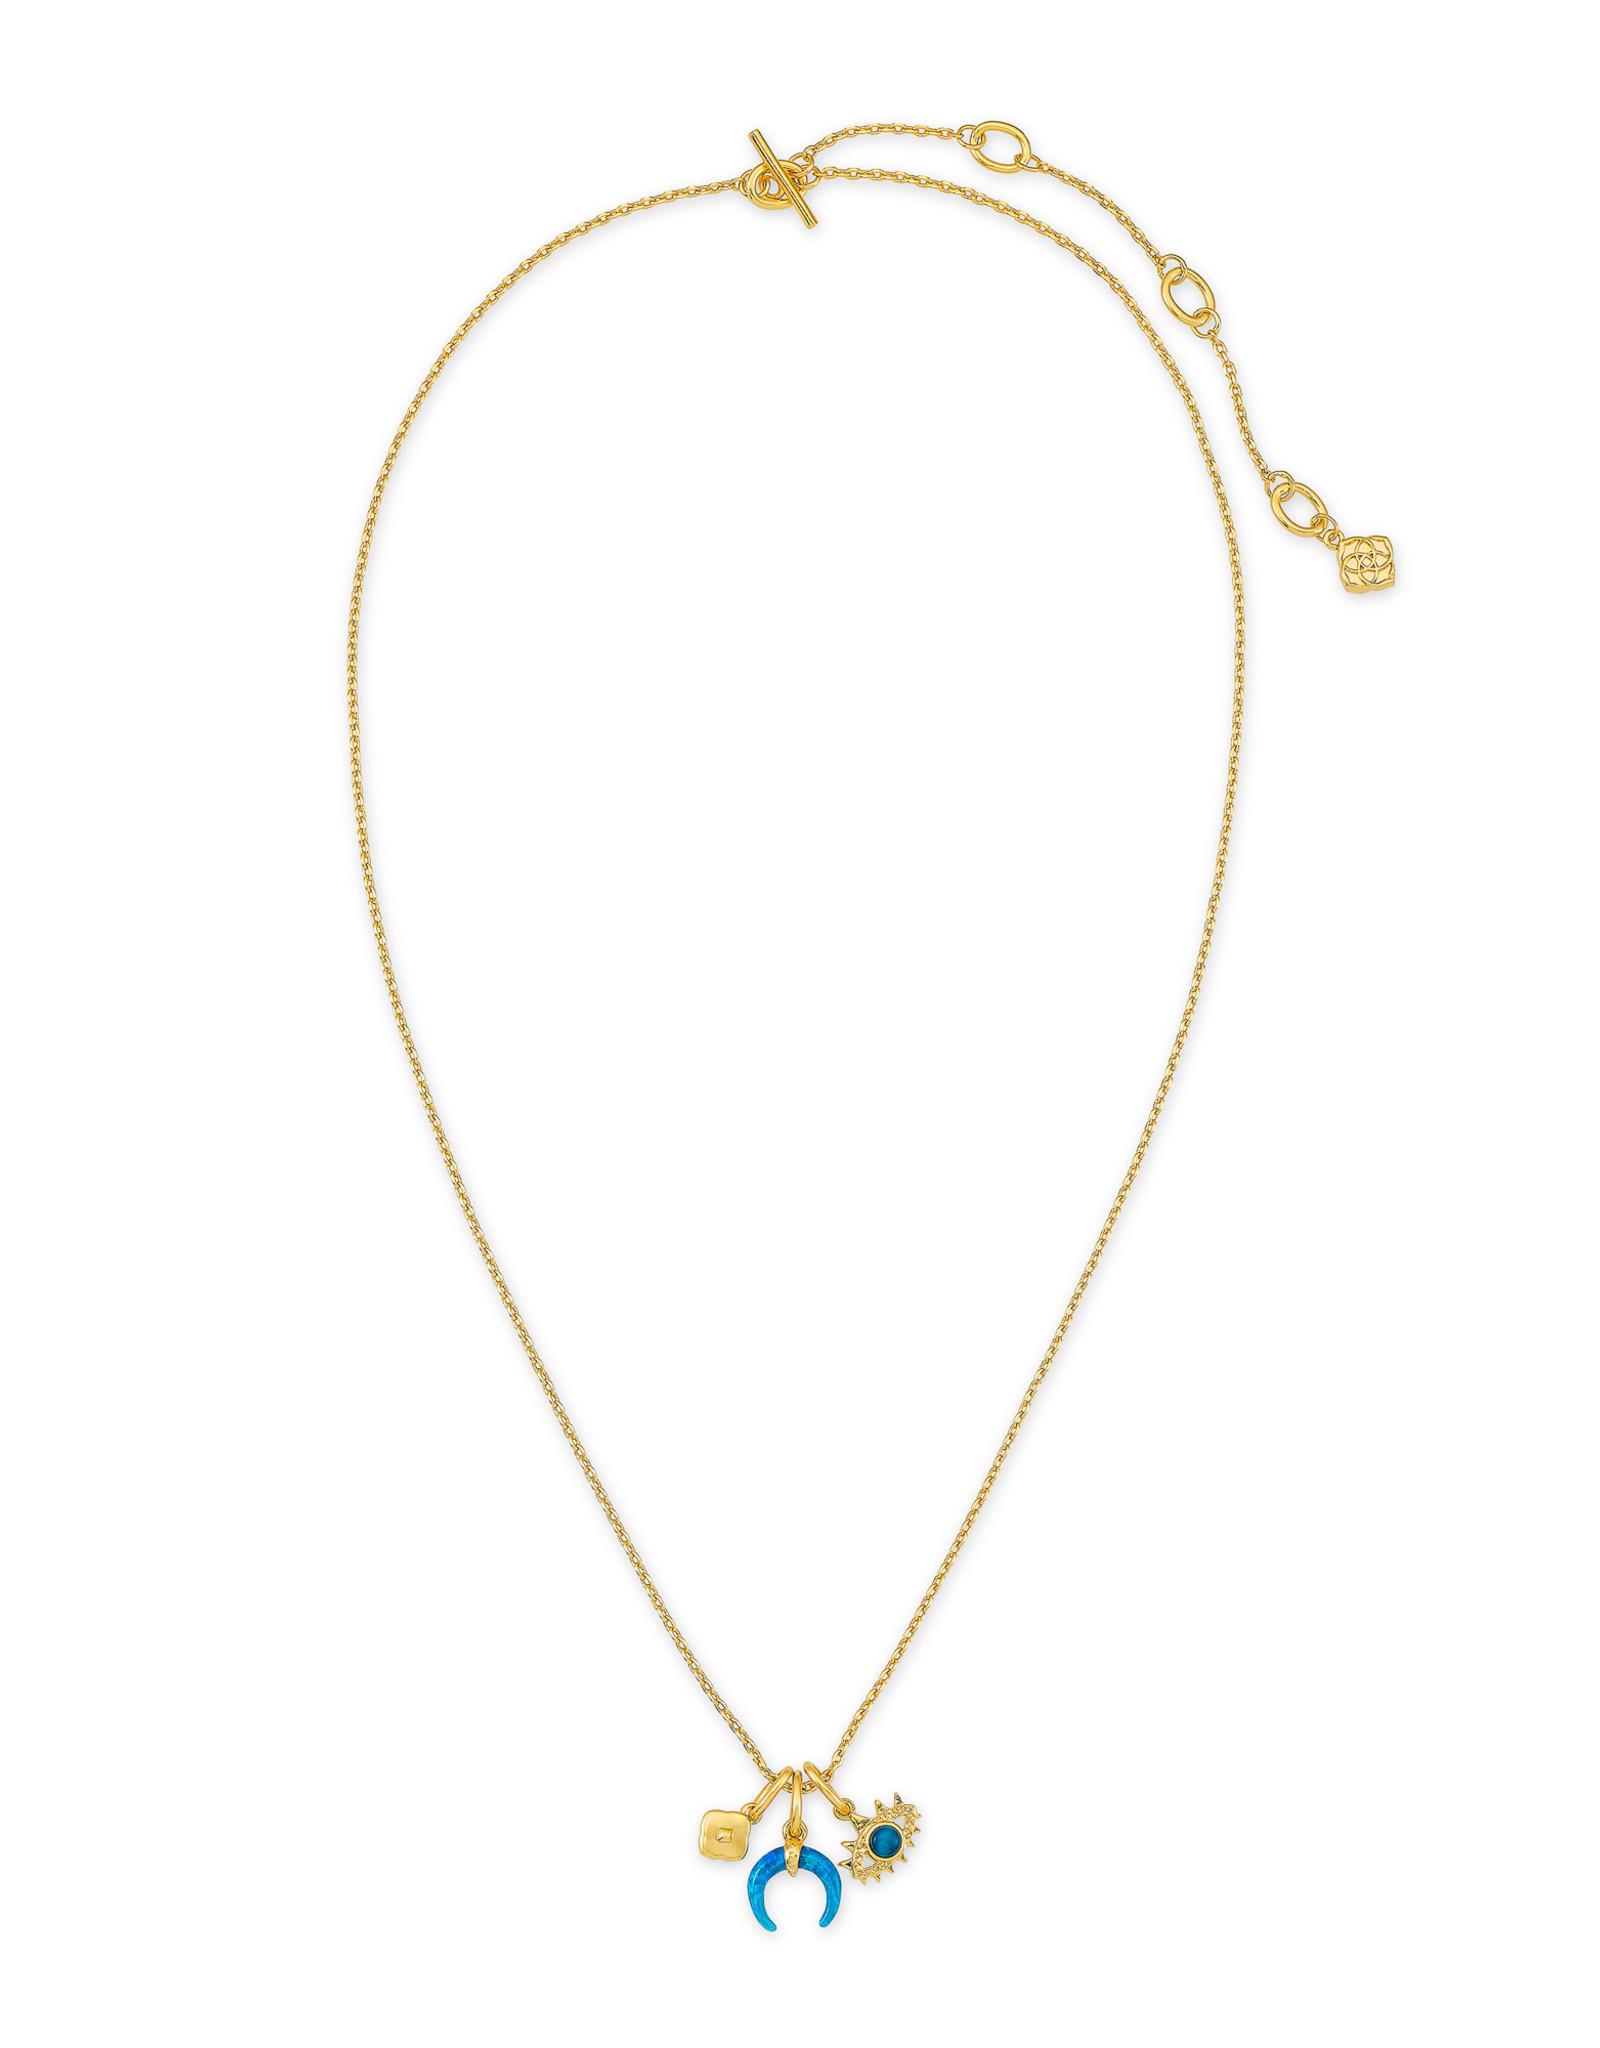 Kendra Scott Kendra Scott Necklace Gemma Charm Set Gold Teal Mix